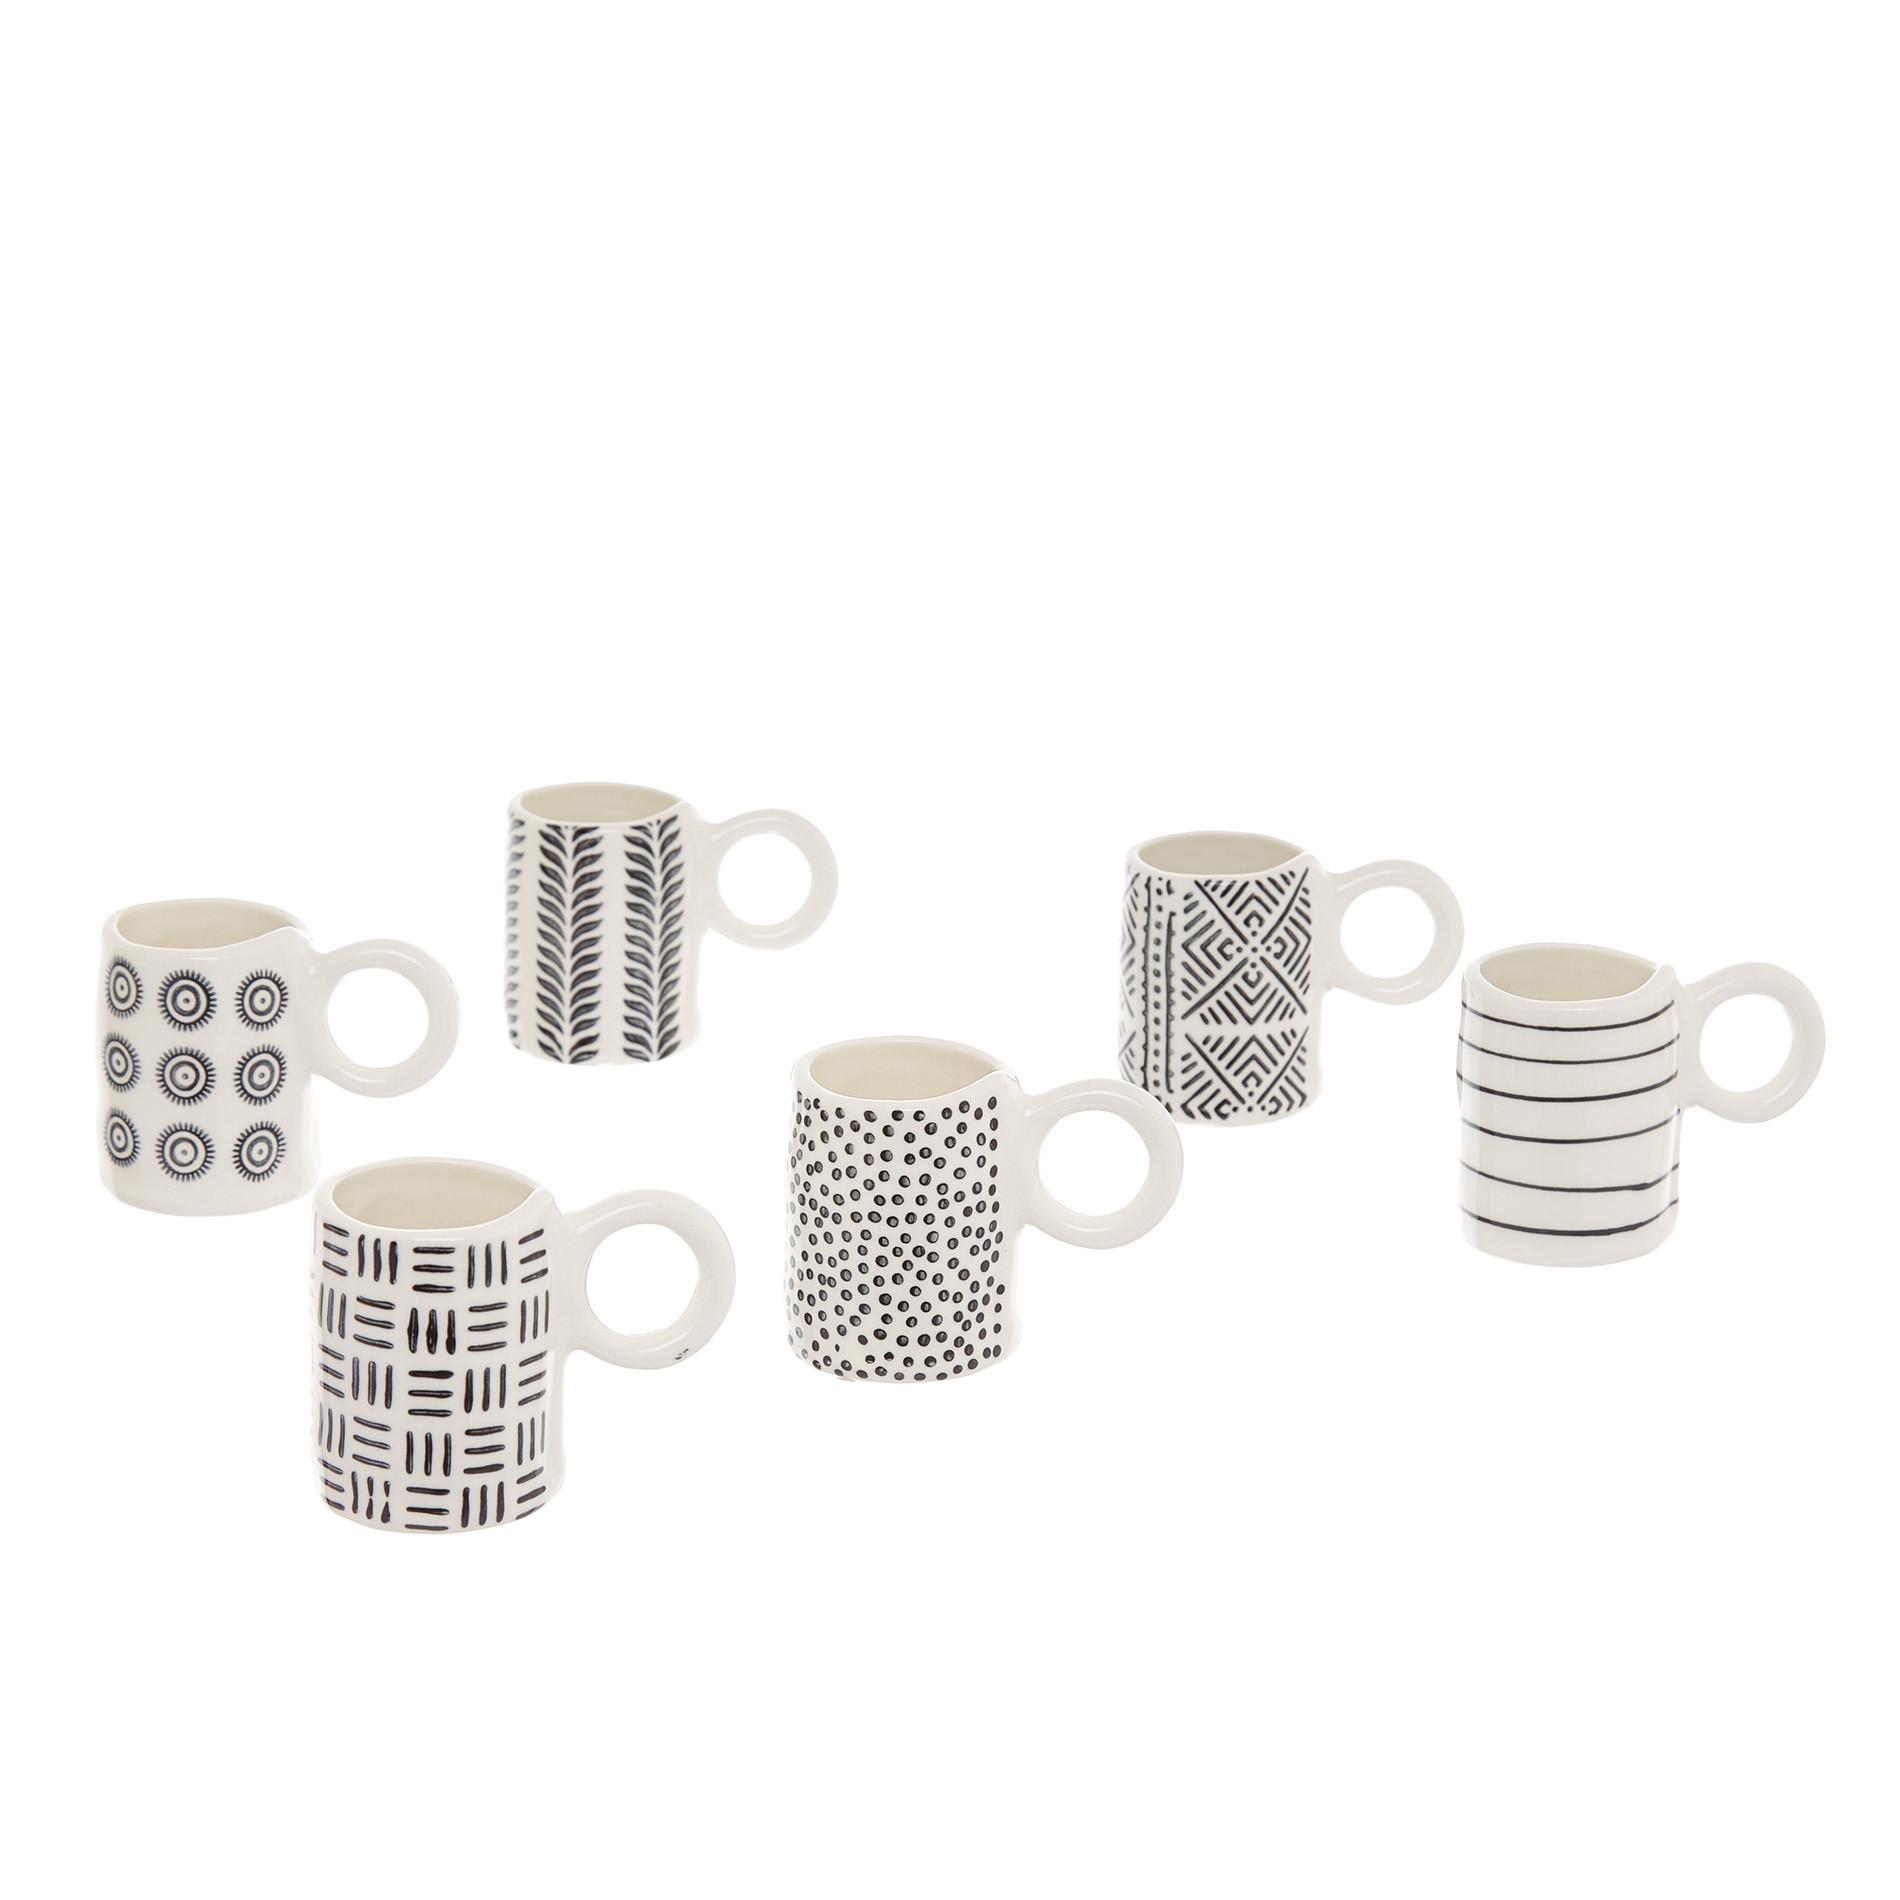 Tazzina caffè ceramica decorata, Bianco/Nero, large image number 0